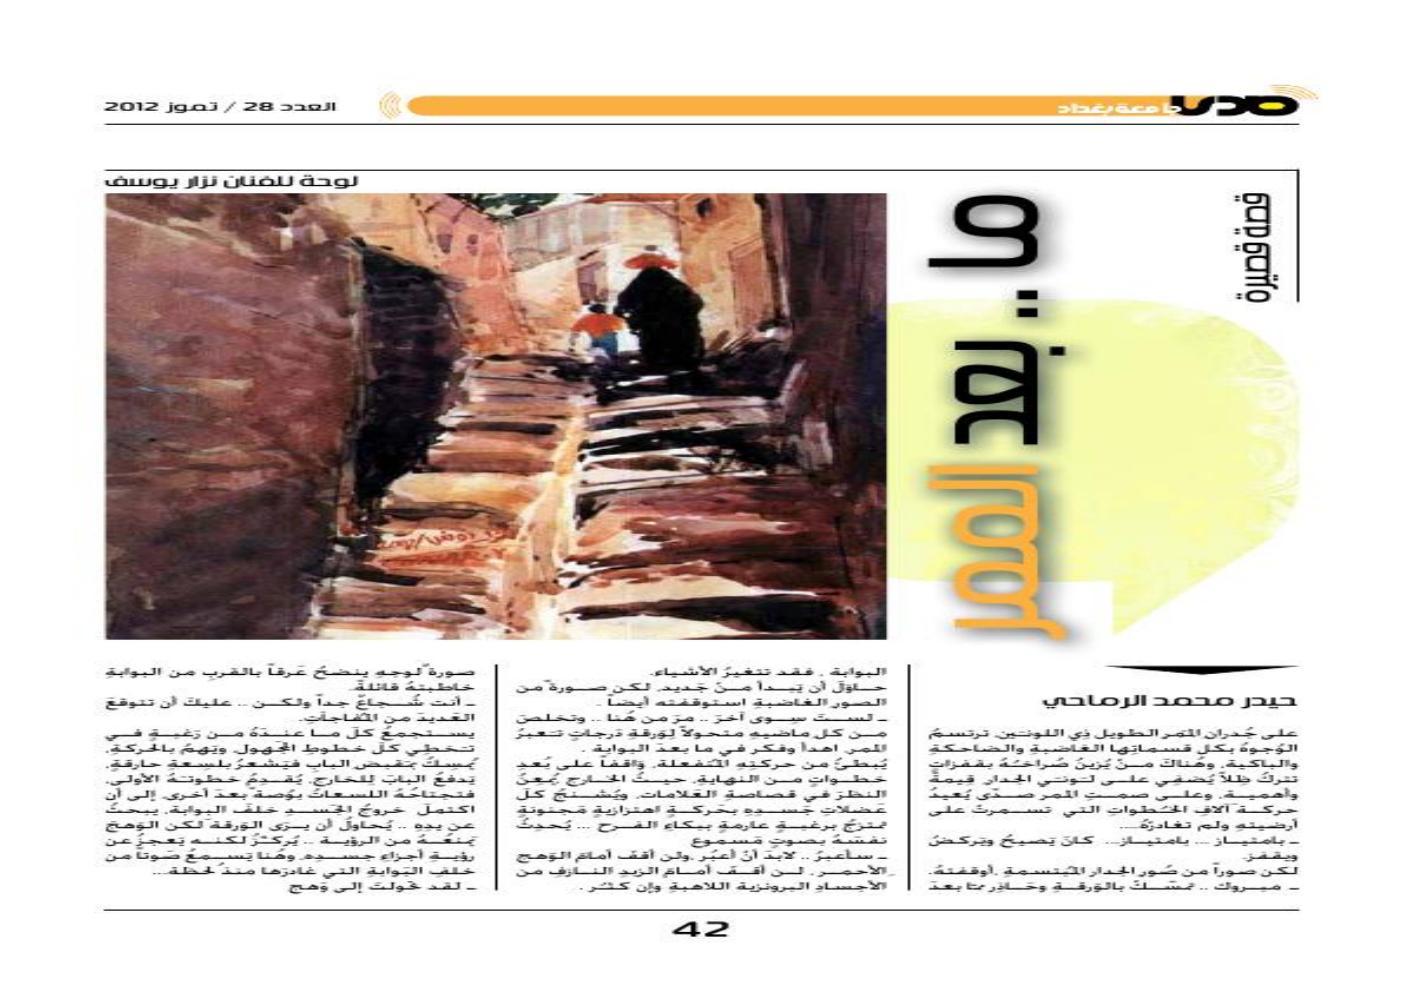 1a9a7d23e Index of /wp-content/uploads/bassim 2012/news/media2/Large